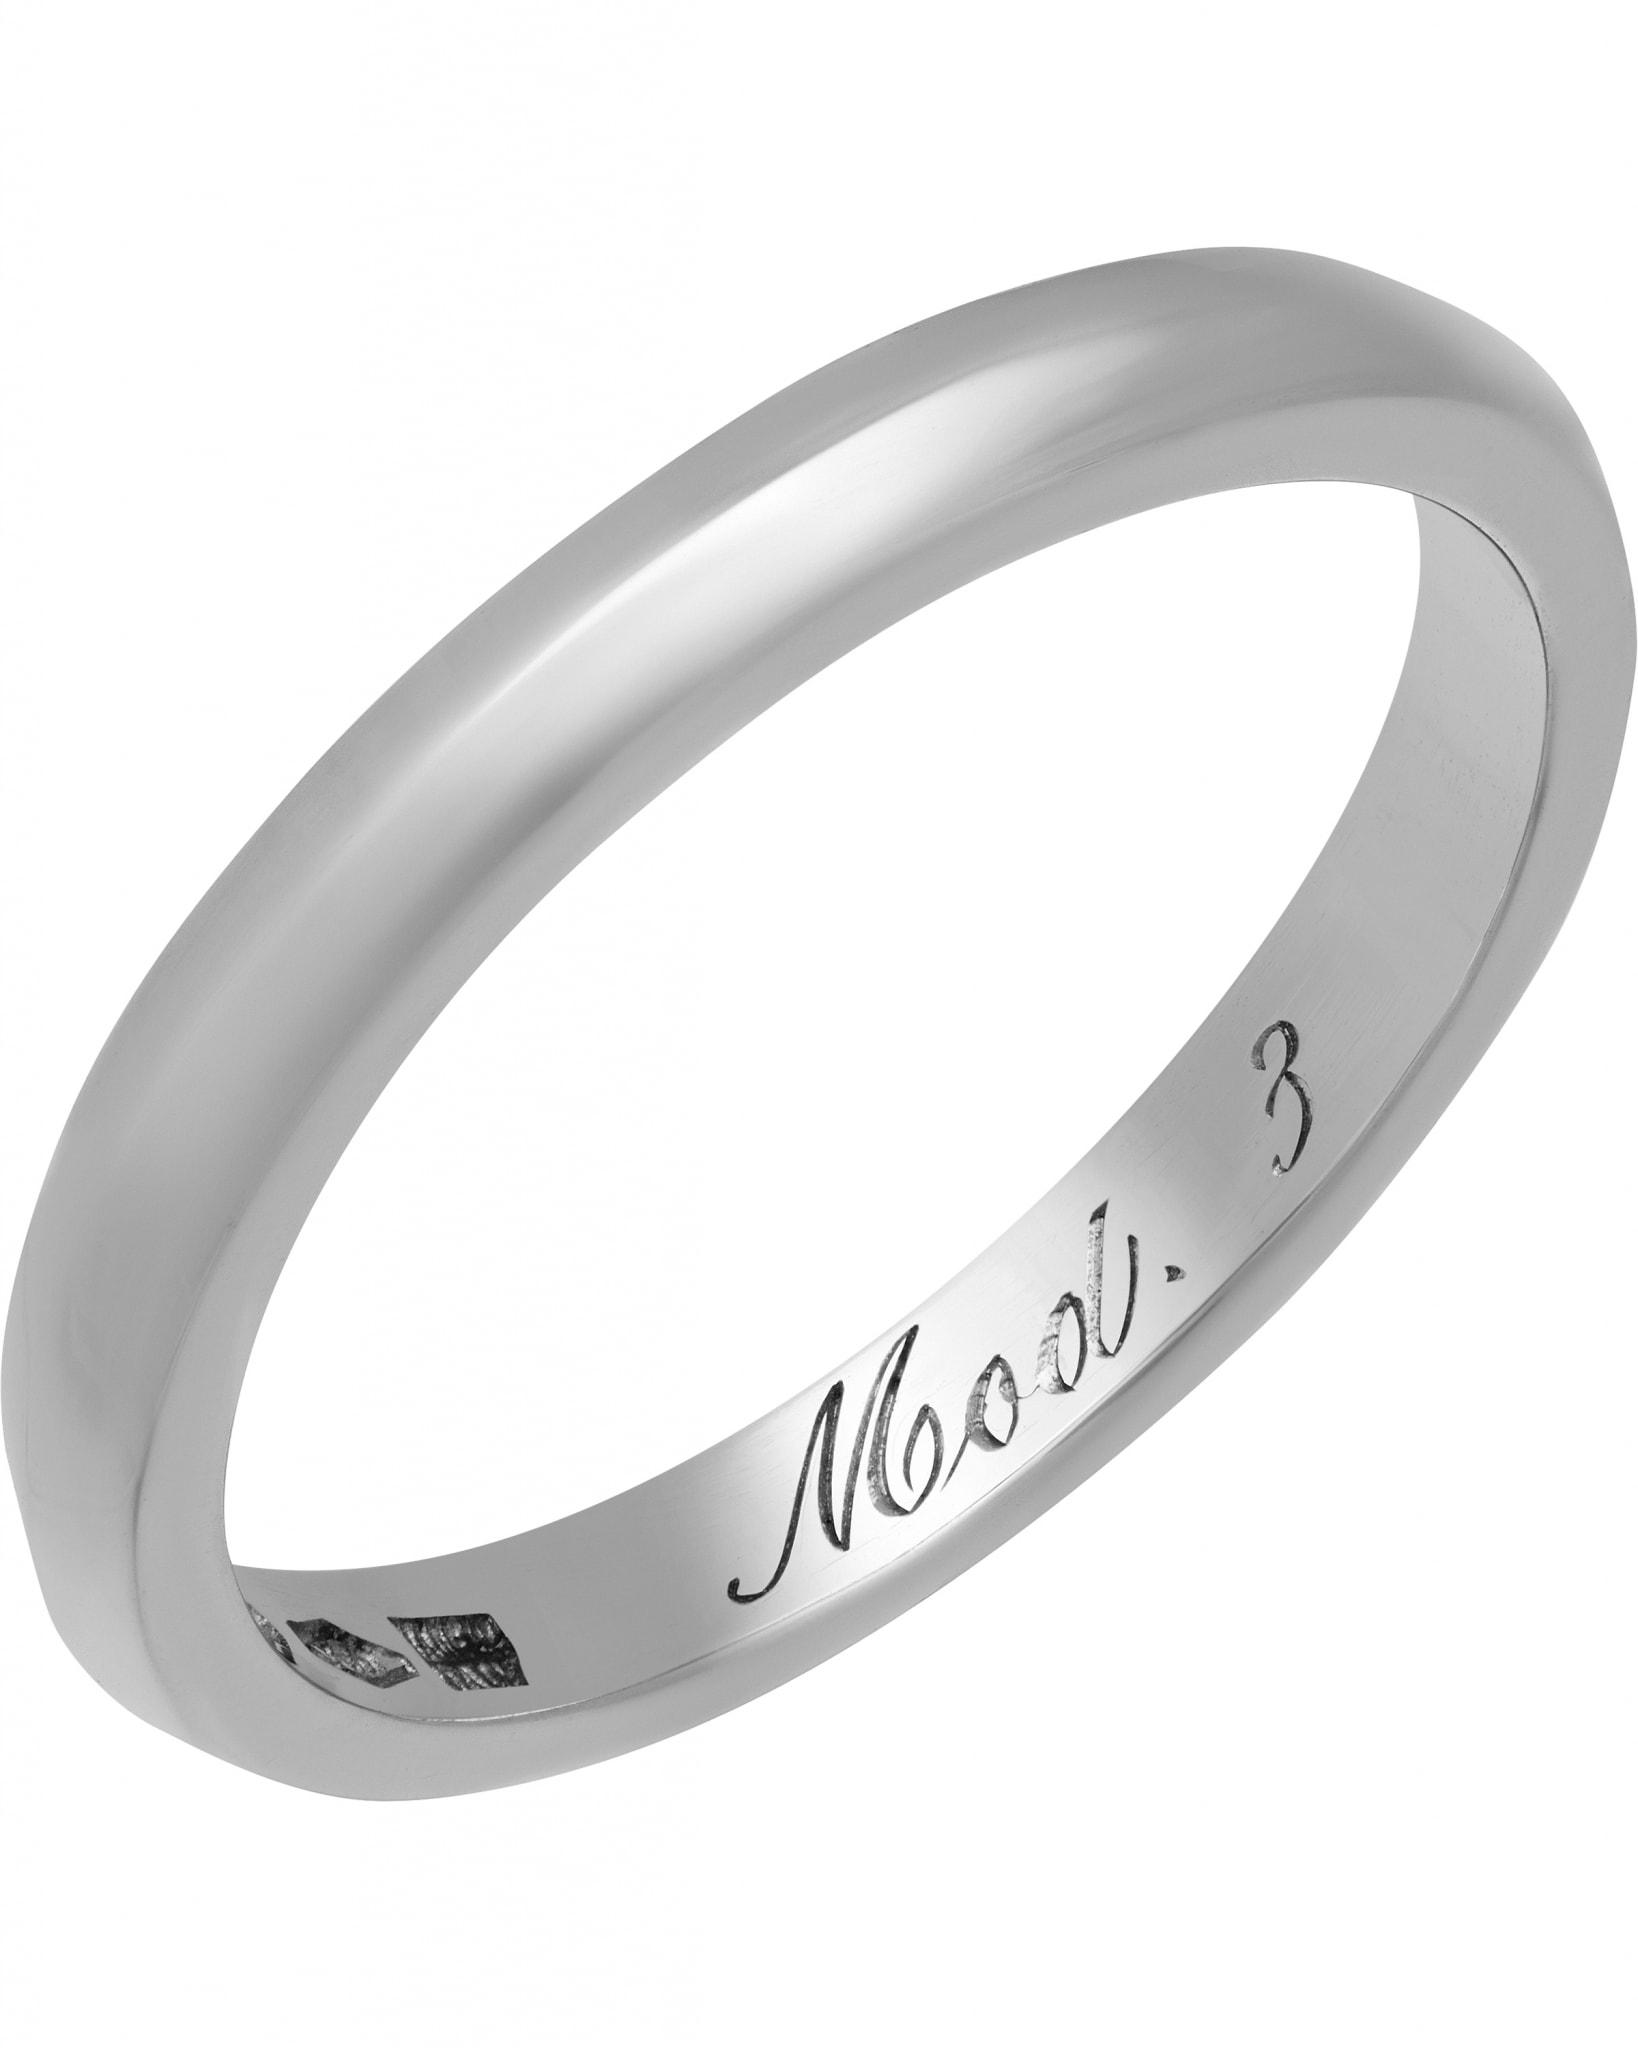 Bvlgari Wedding Ring Platinum Mod. 3 AN852825 337925 Ring Sz 5